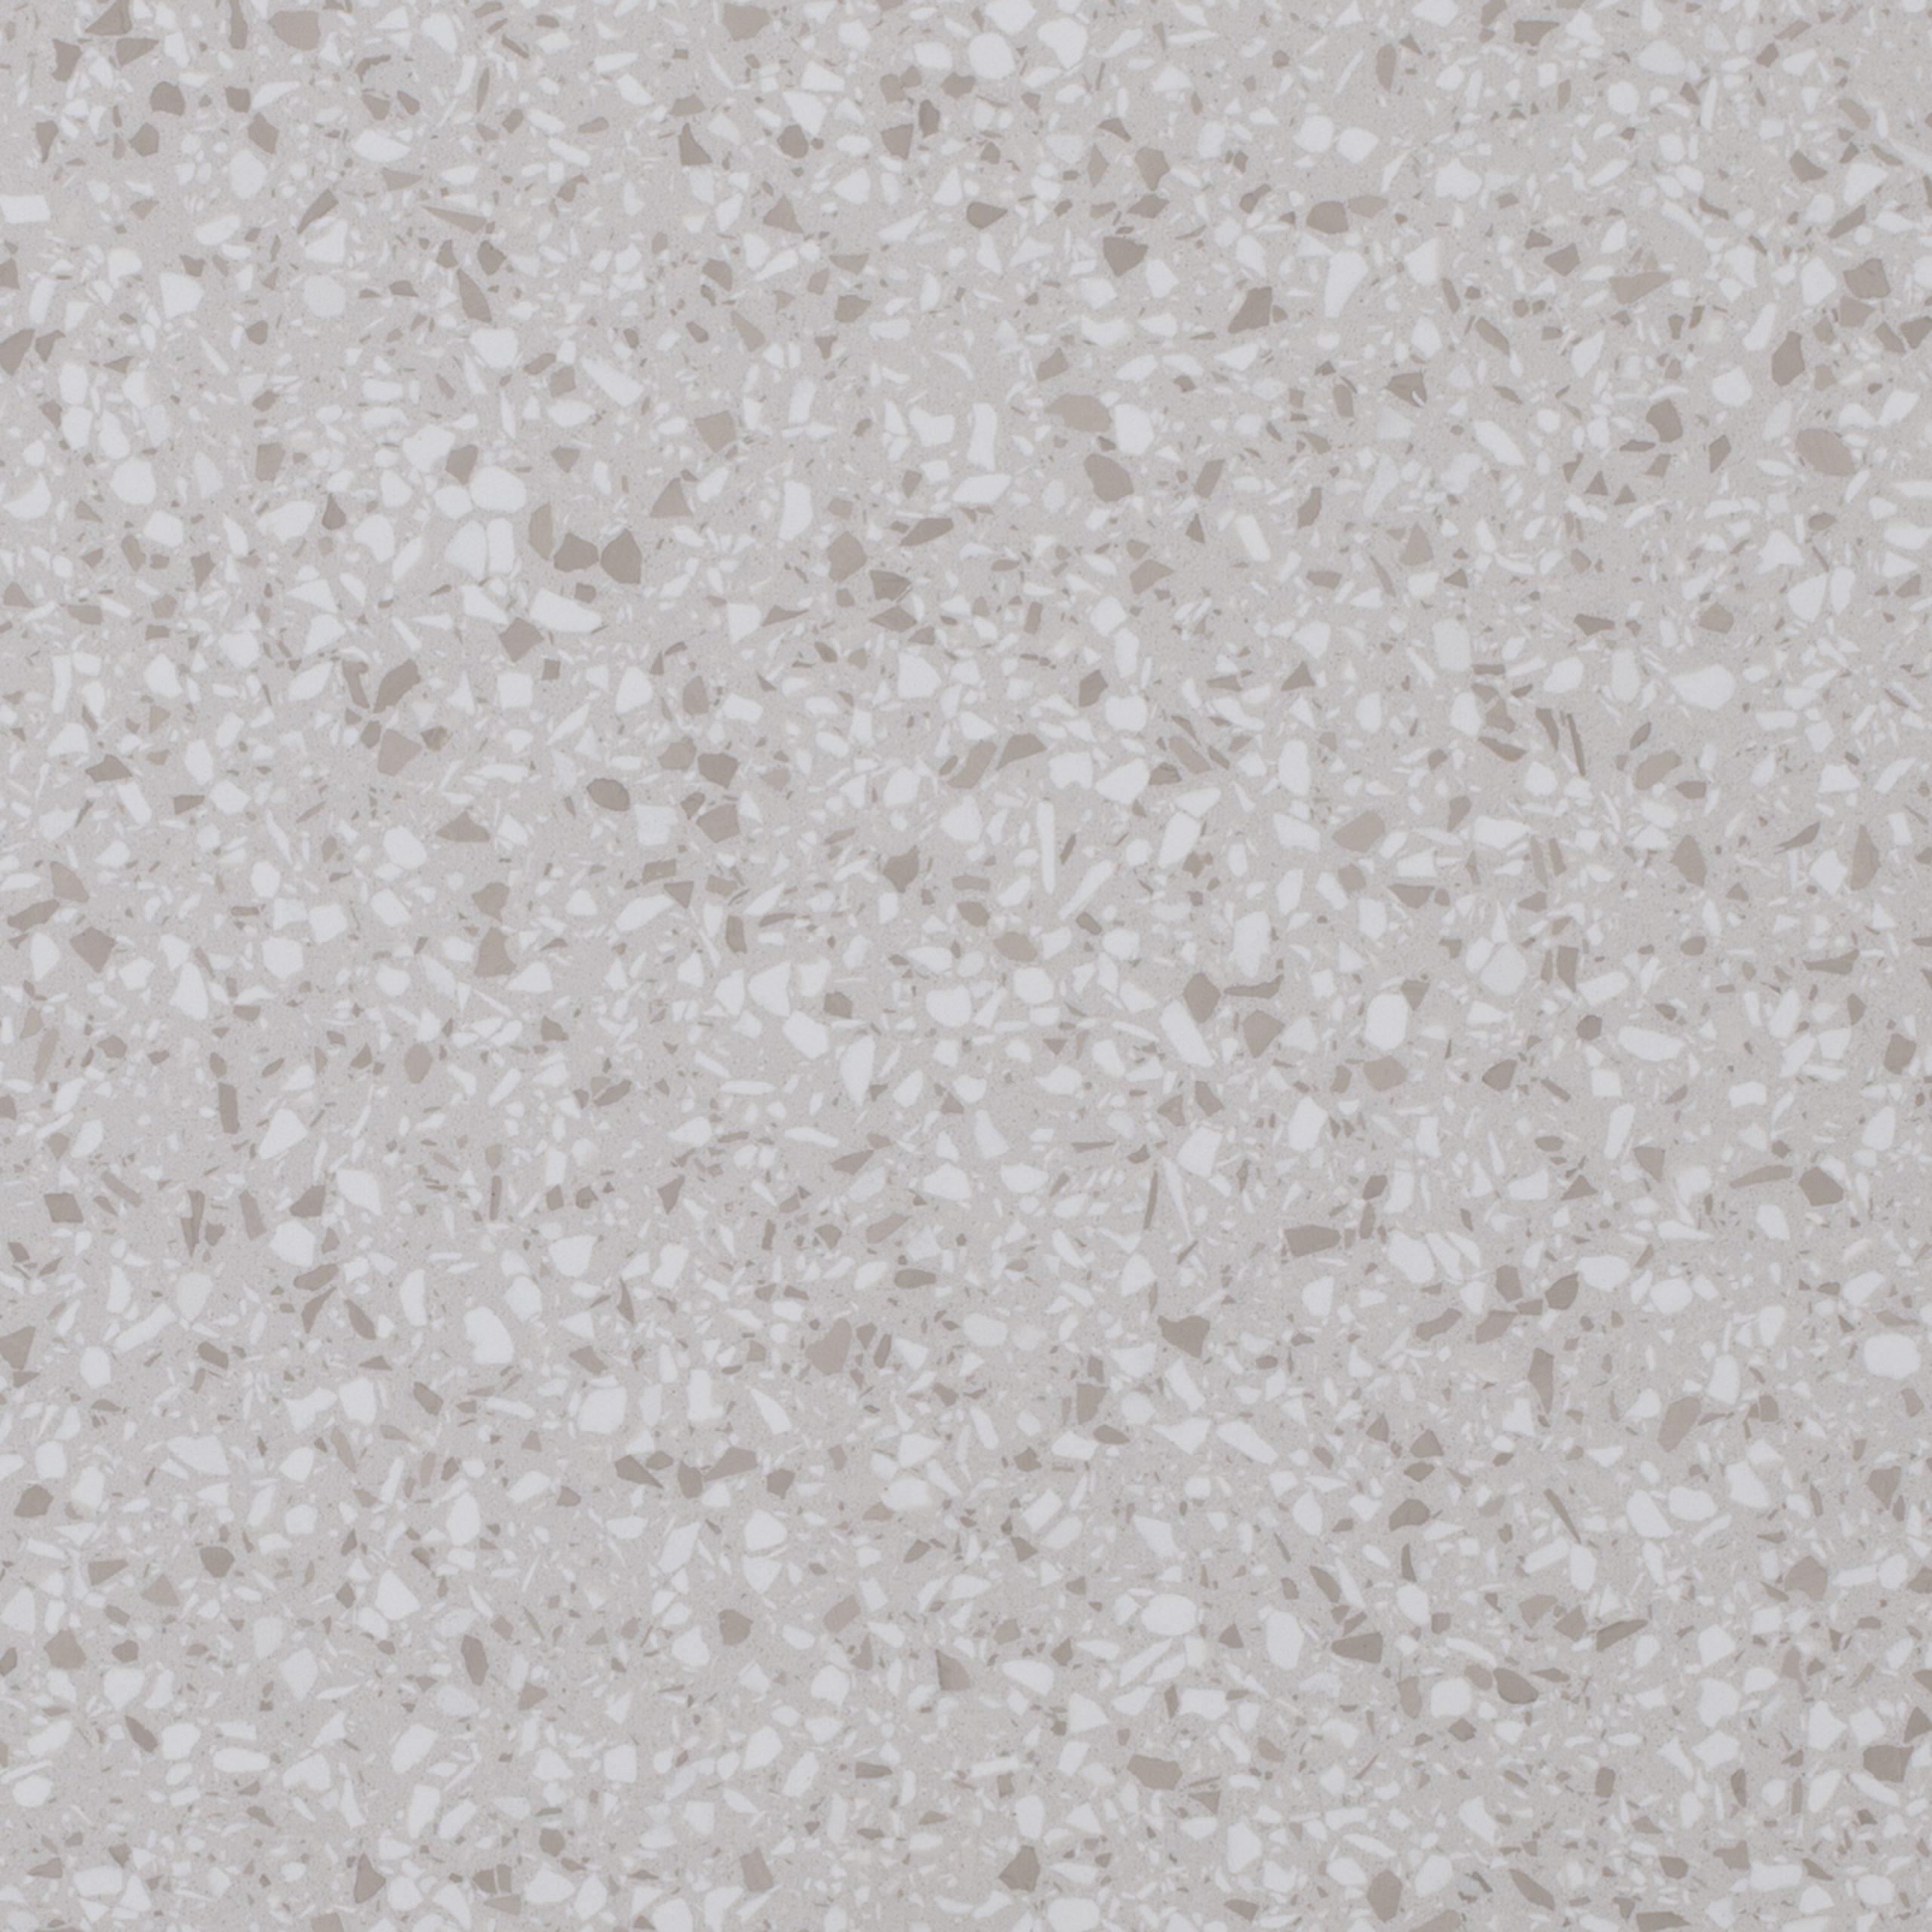 Stone Italiana Terrazzo White Marble Trend Marble